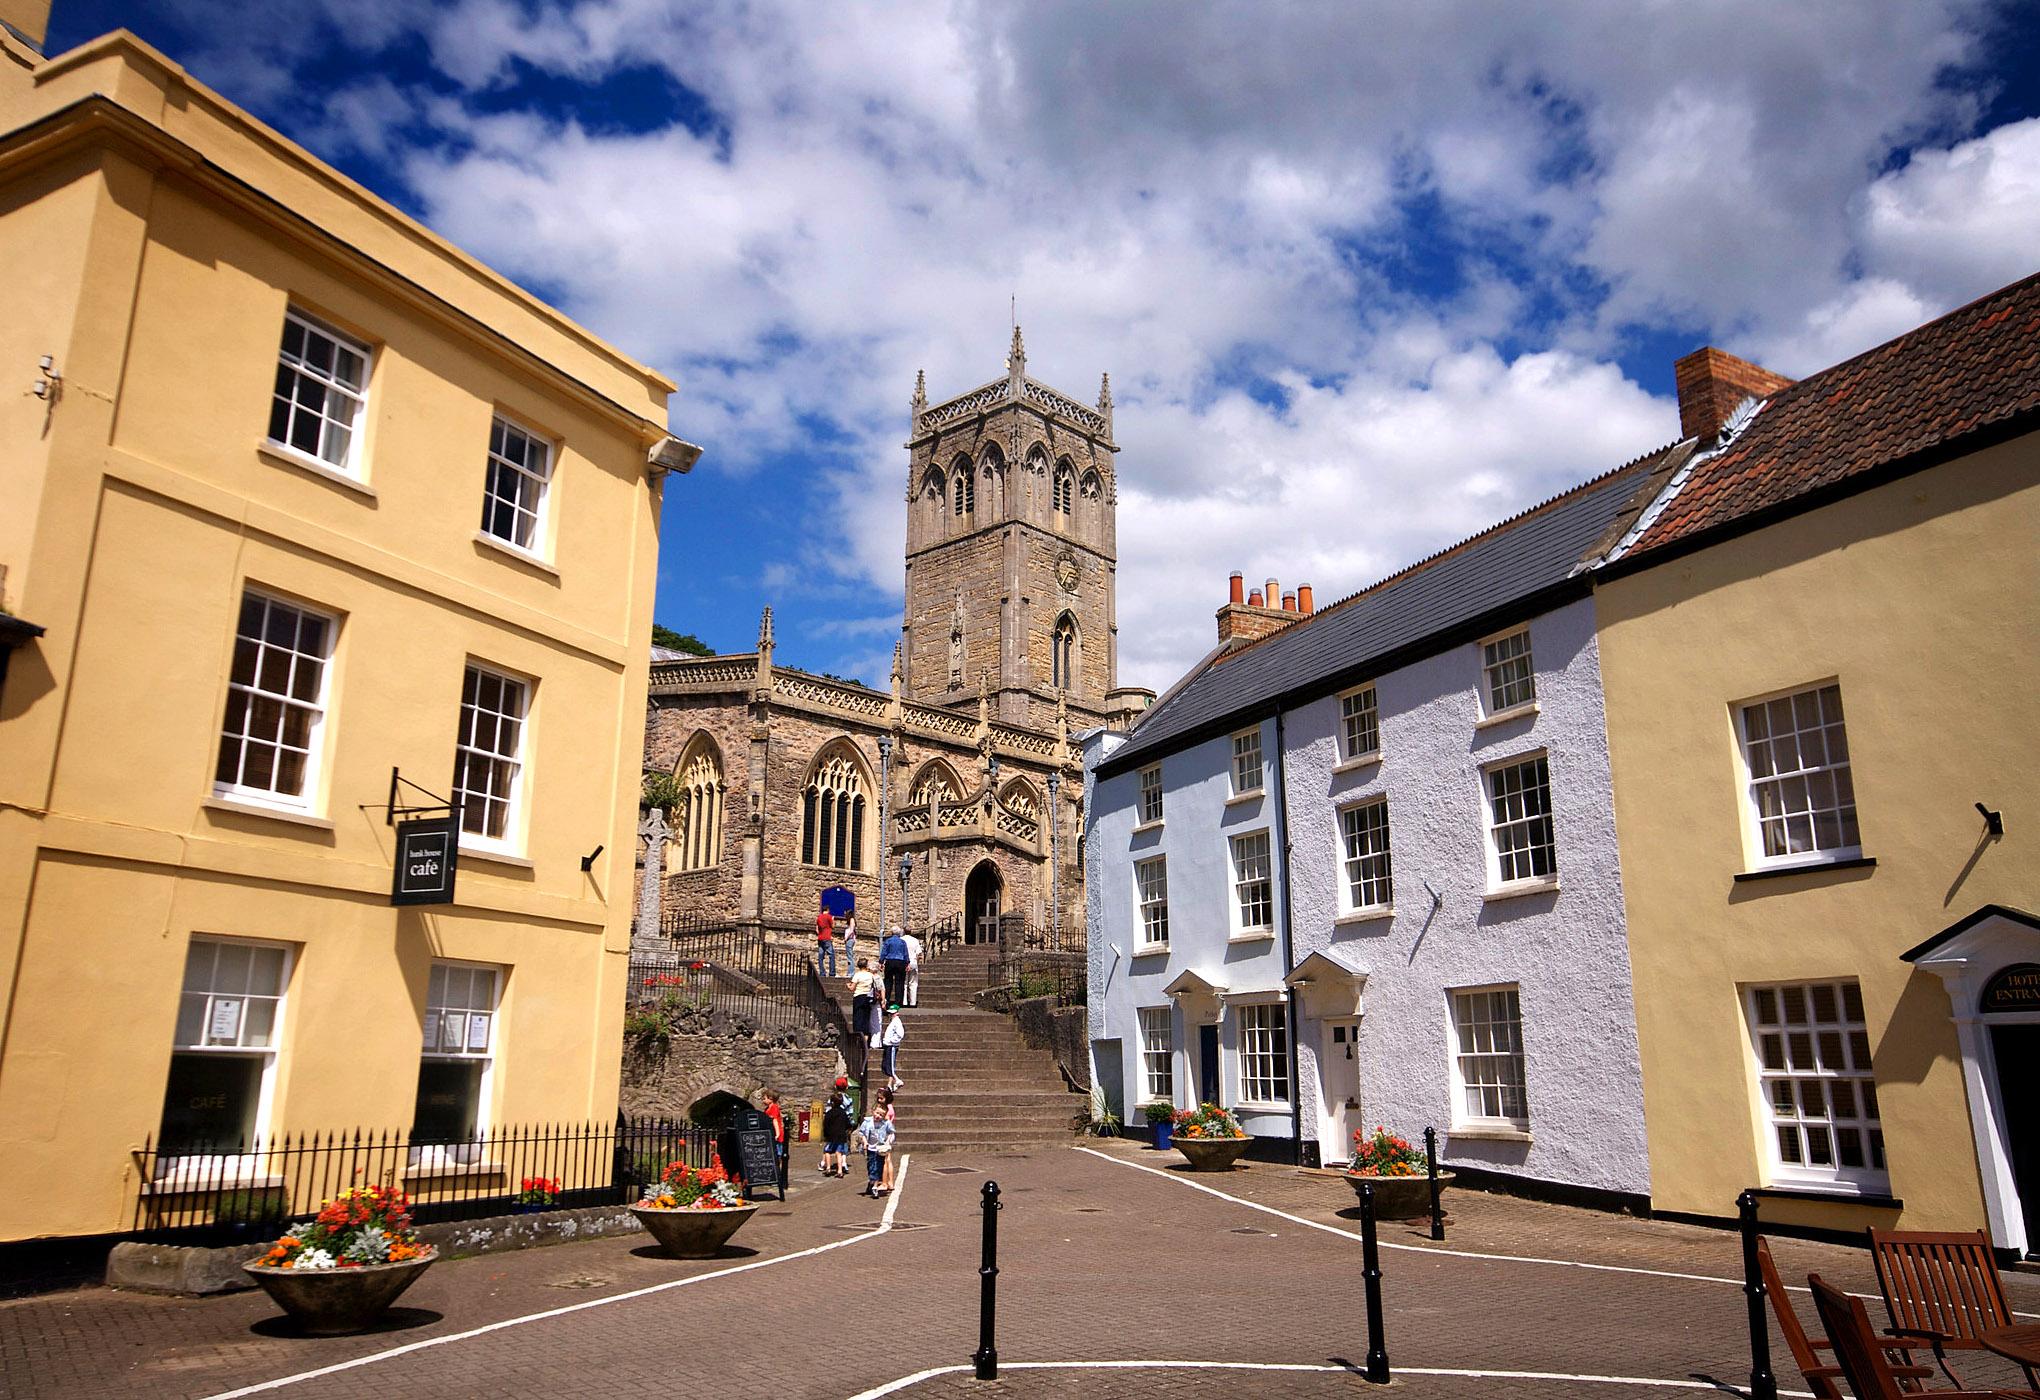 Across the Square, Axbridge, Somerset by Archidave.jpg